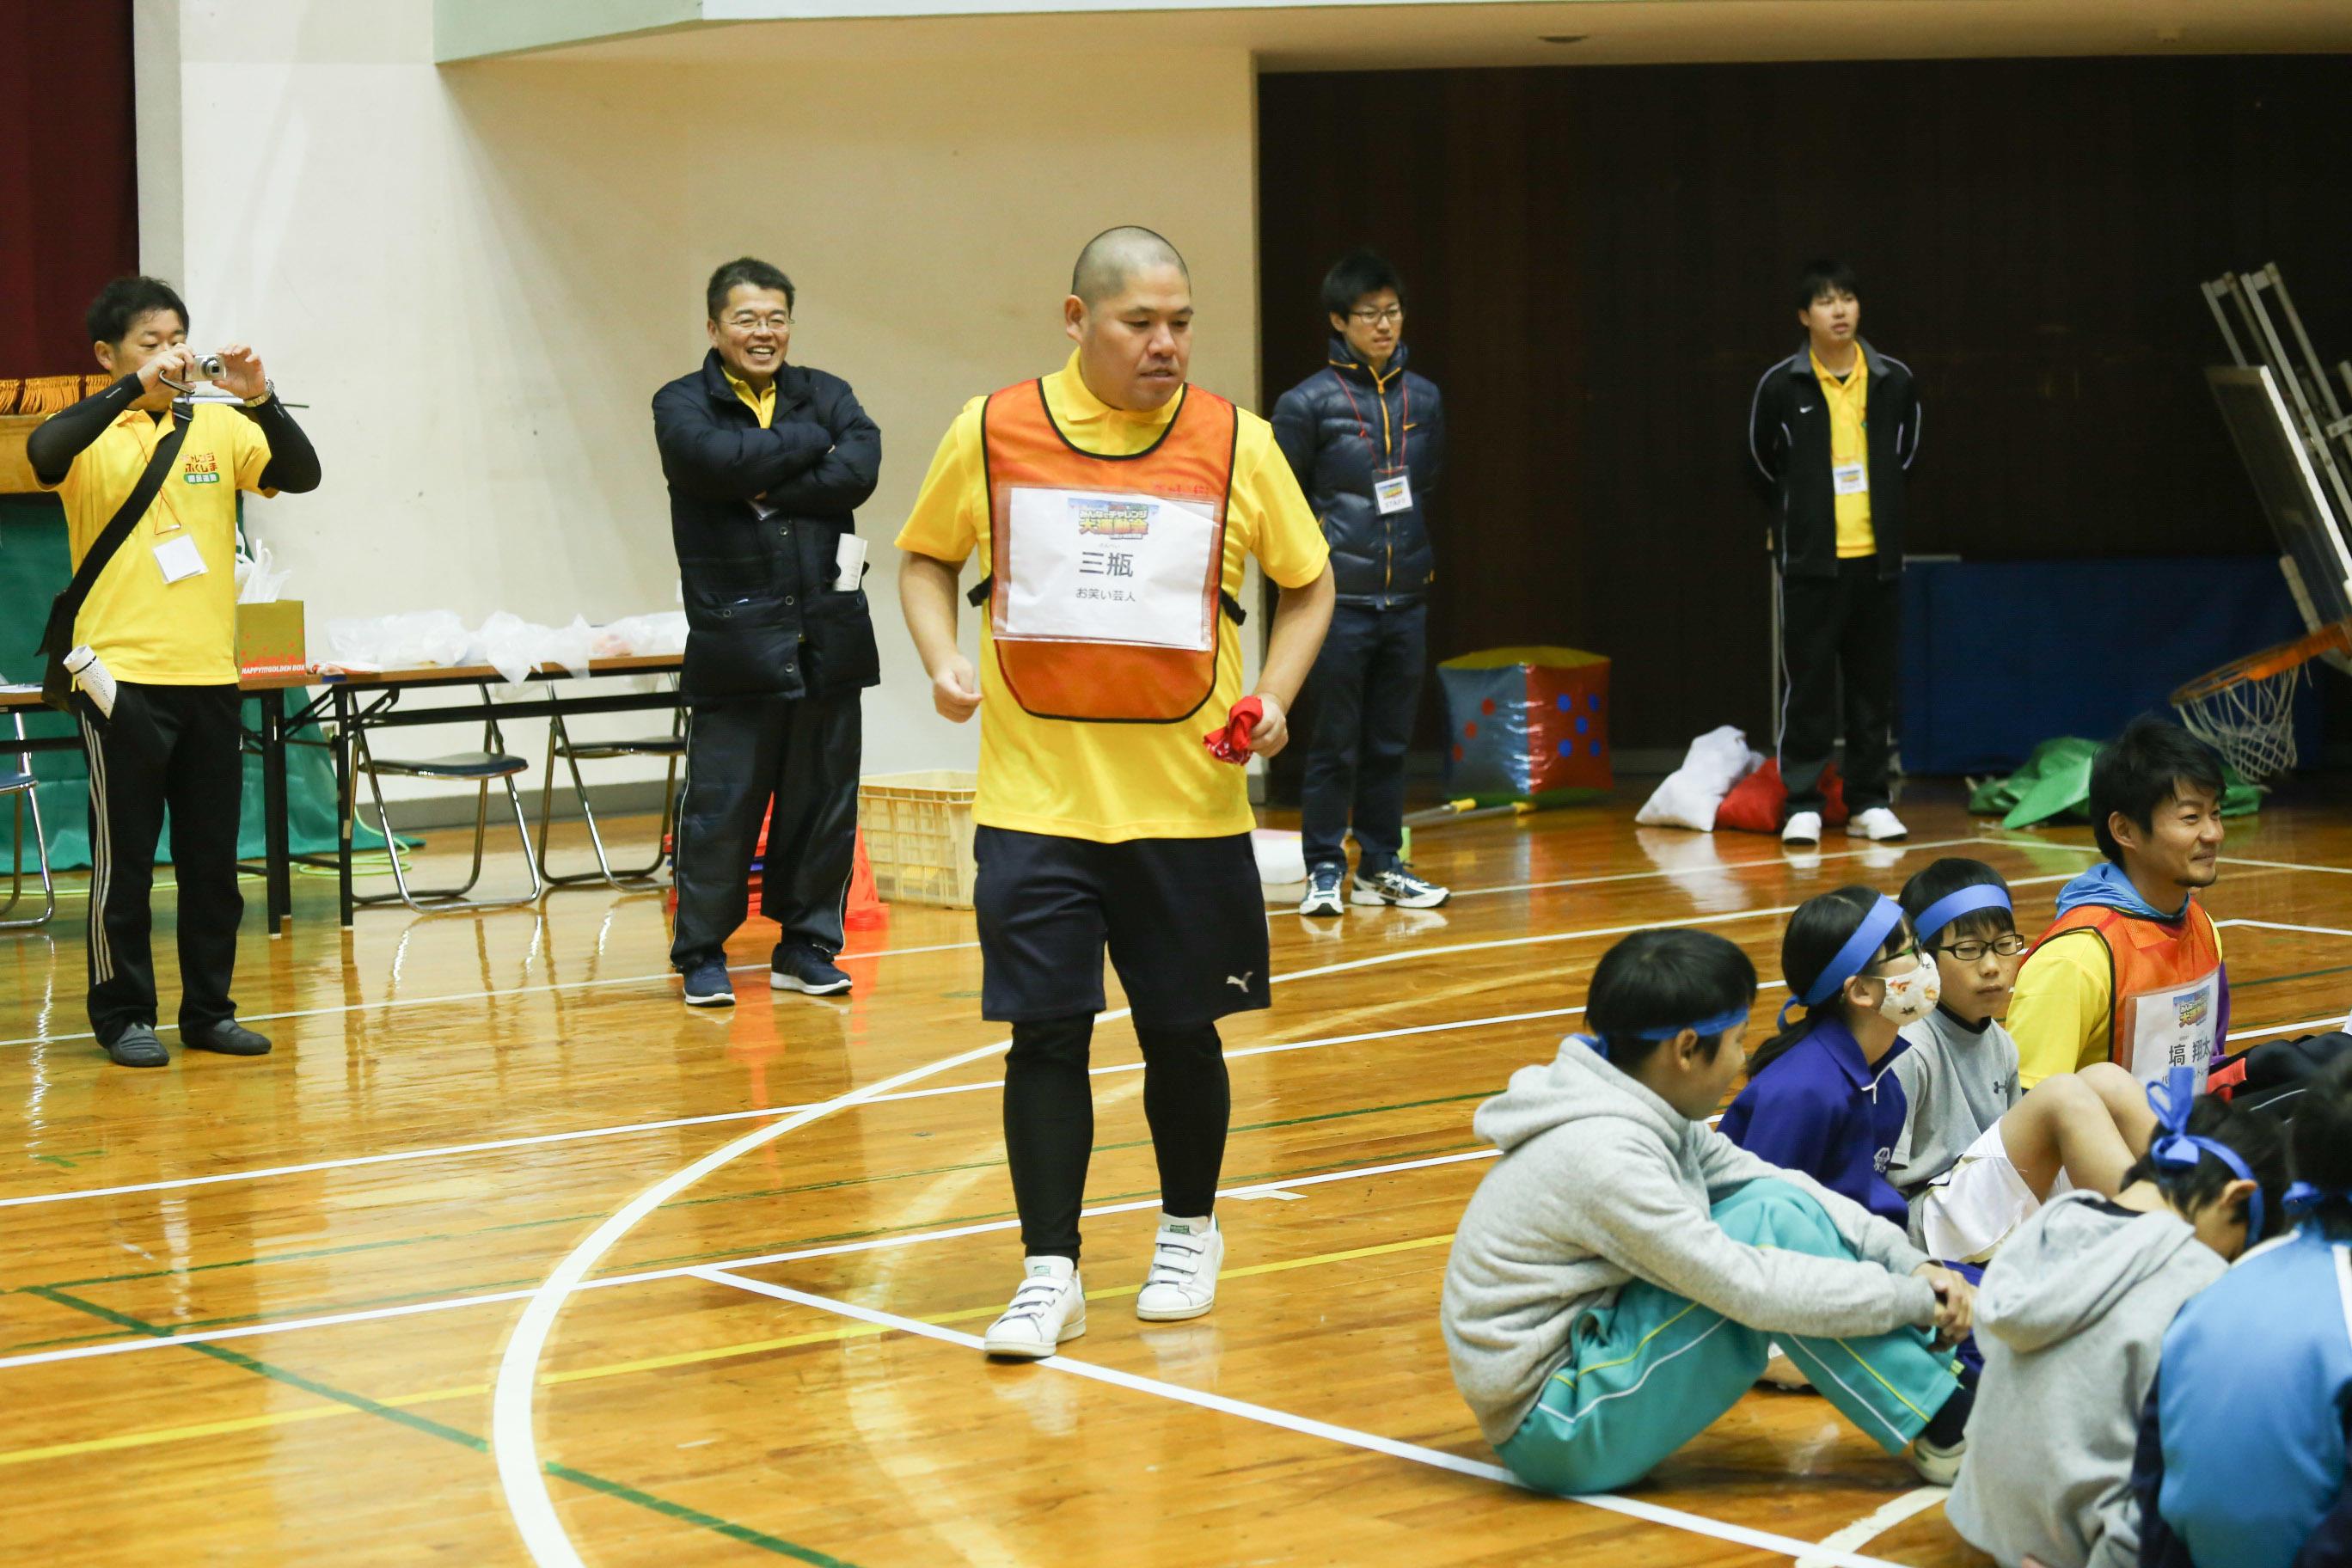 http://news.yoshimoto.co.jp/20171129093508-f473479b0f5cb4e1b4d41d47ebacb5c0b1fcbbe4.jpg